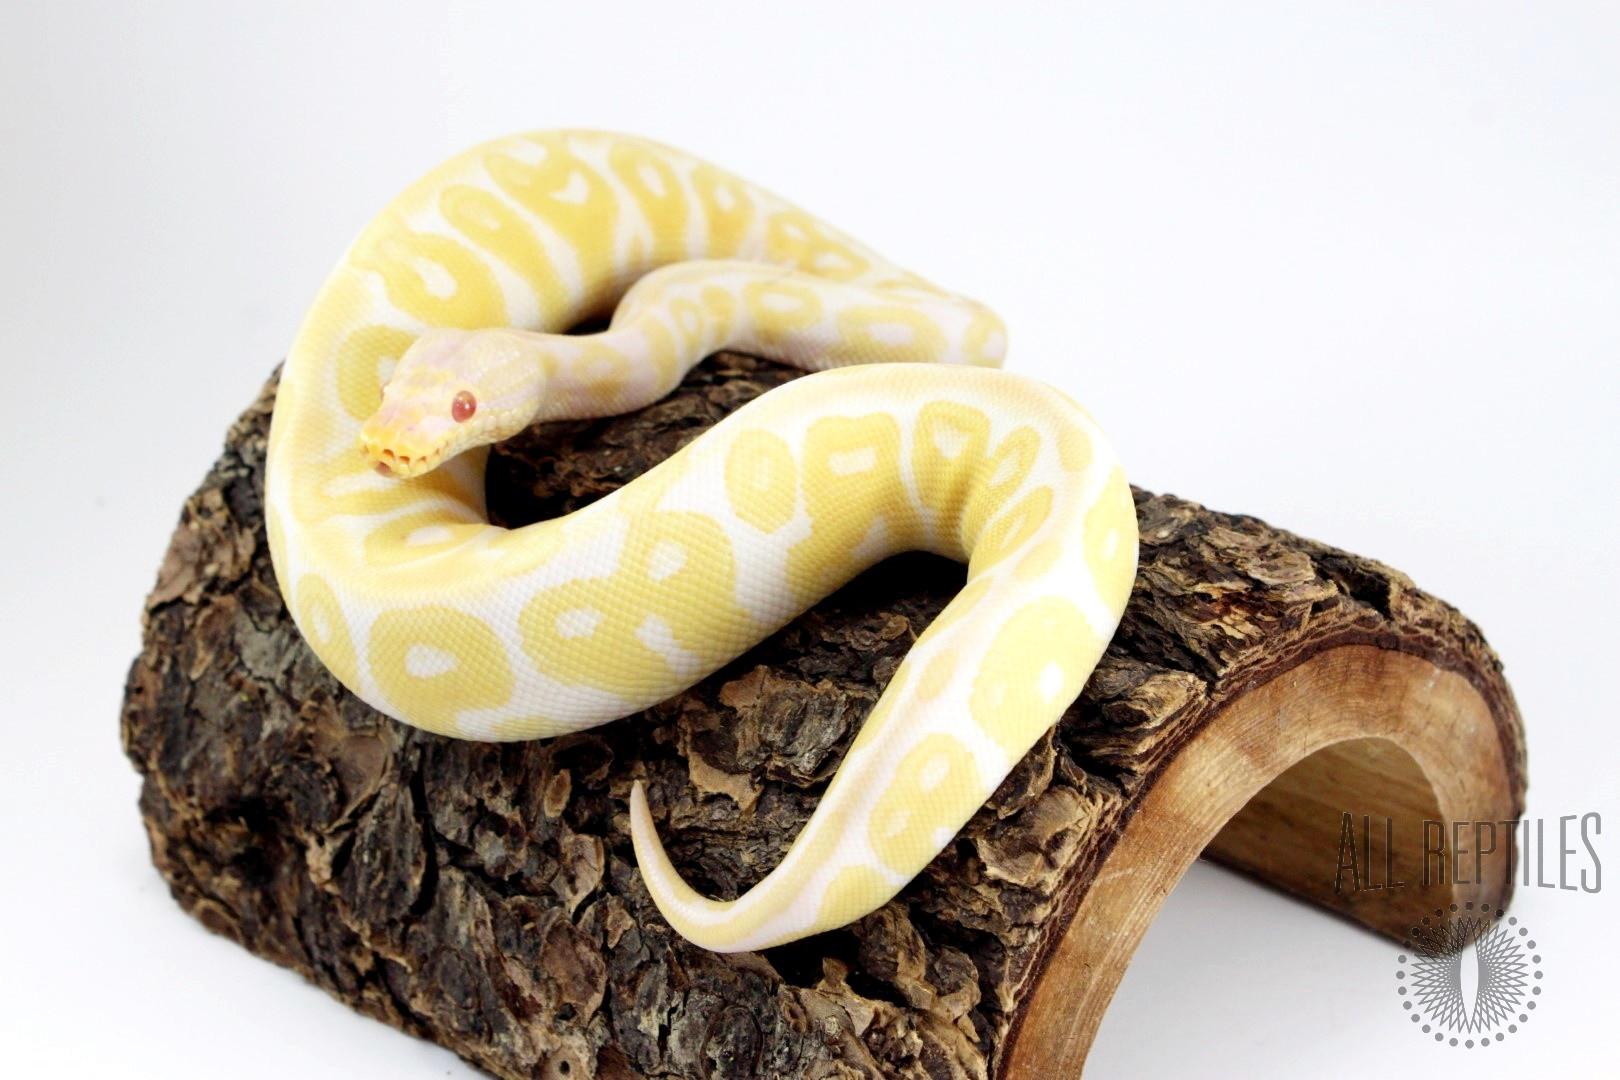 Pastel Albino Asphalt or Yellow Belly HRA Ball Python